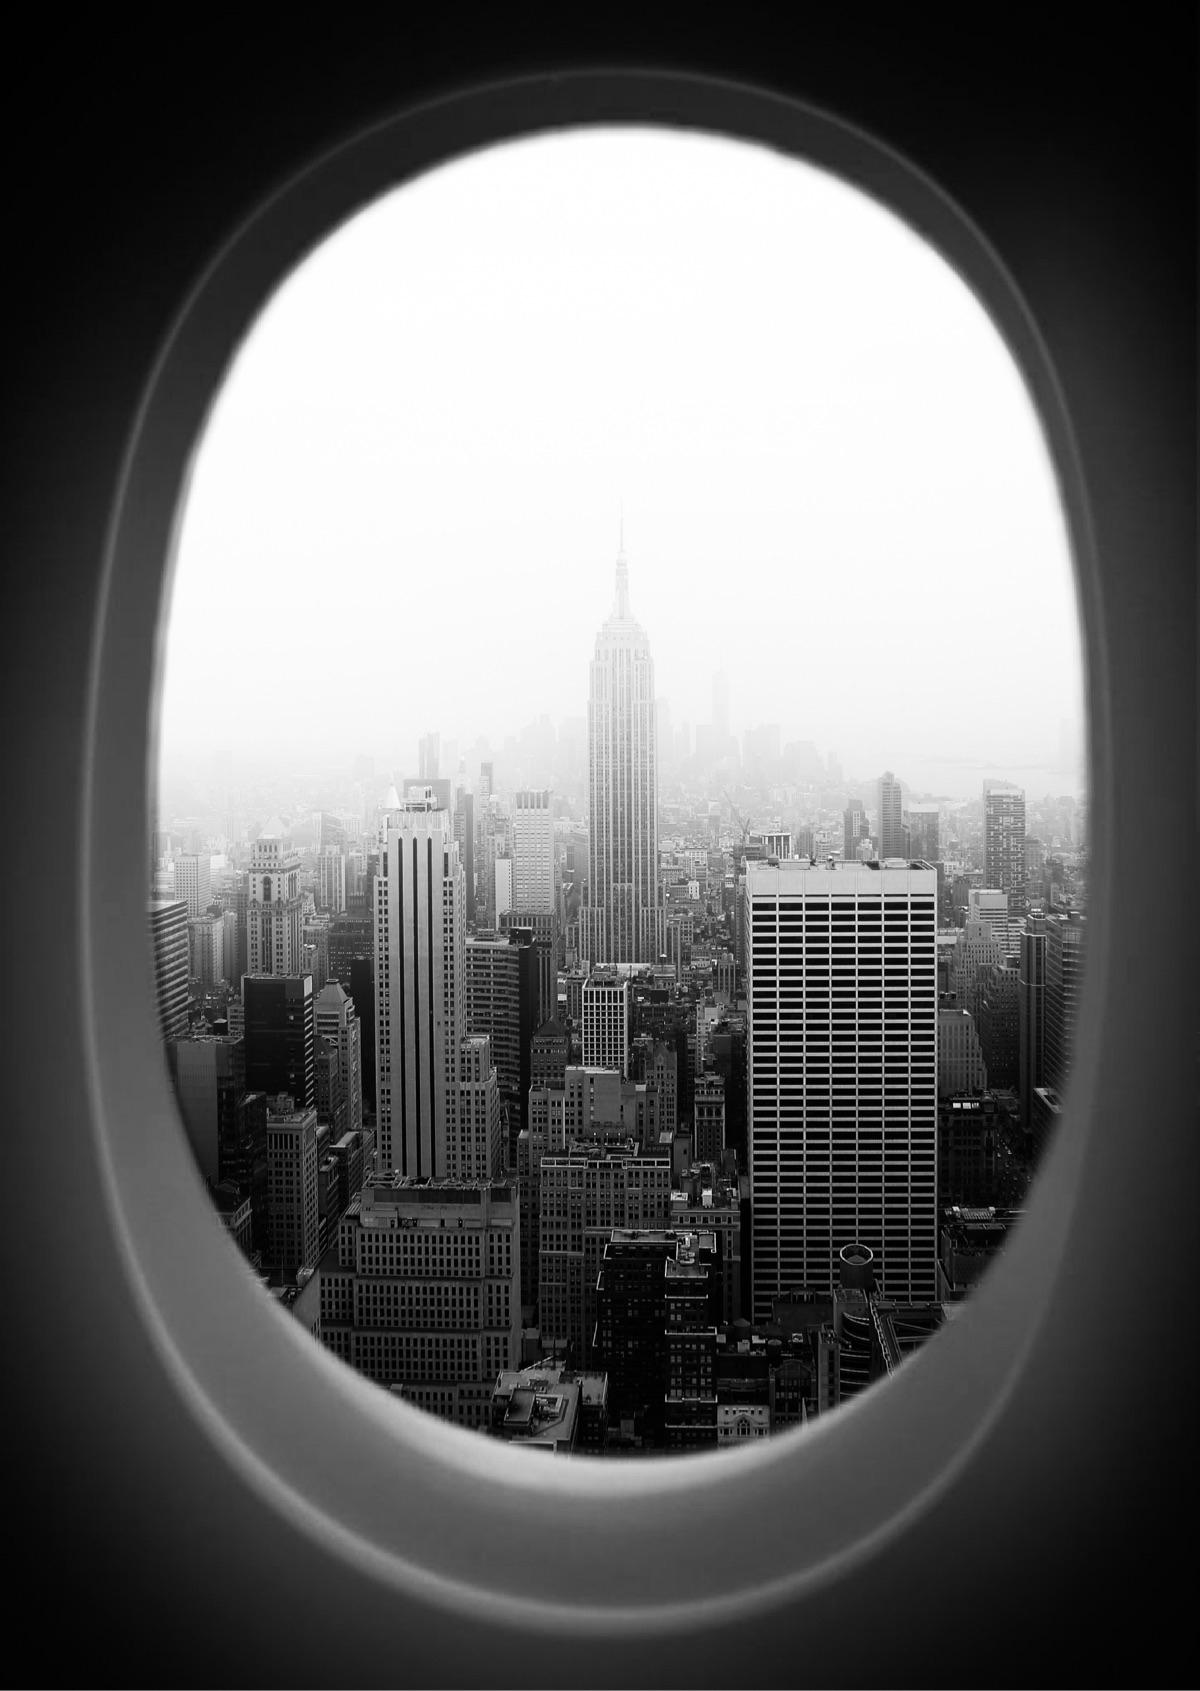 Imagination - nyc, views, window - raylivez | ello